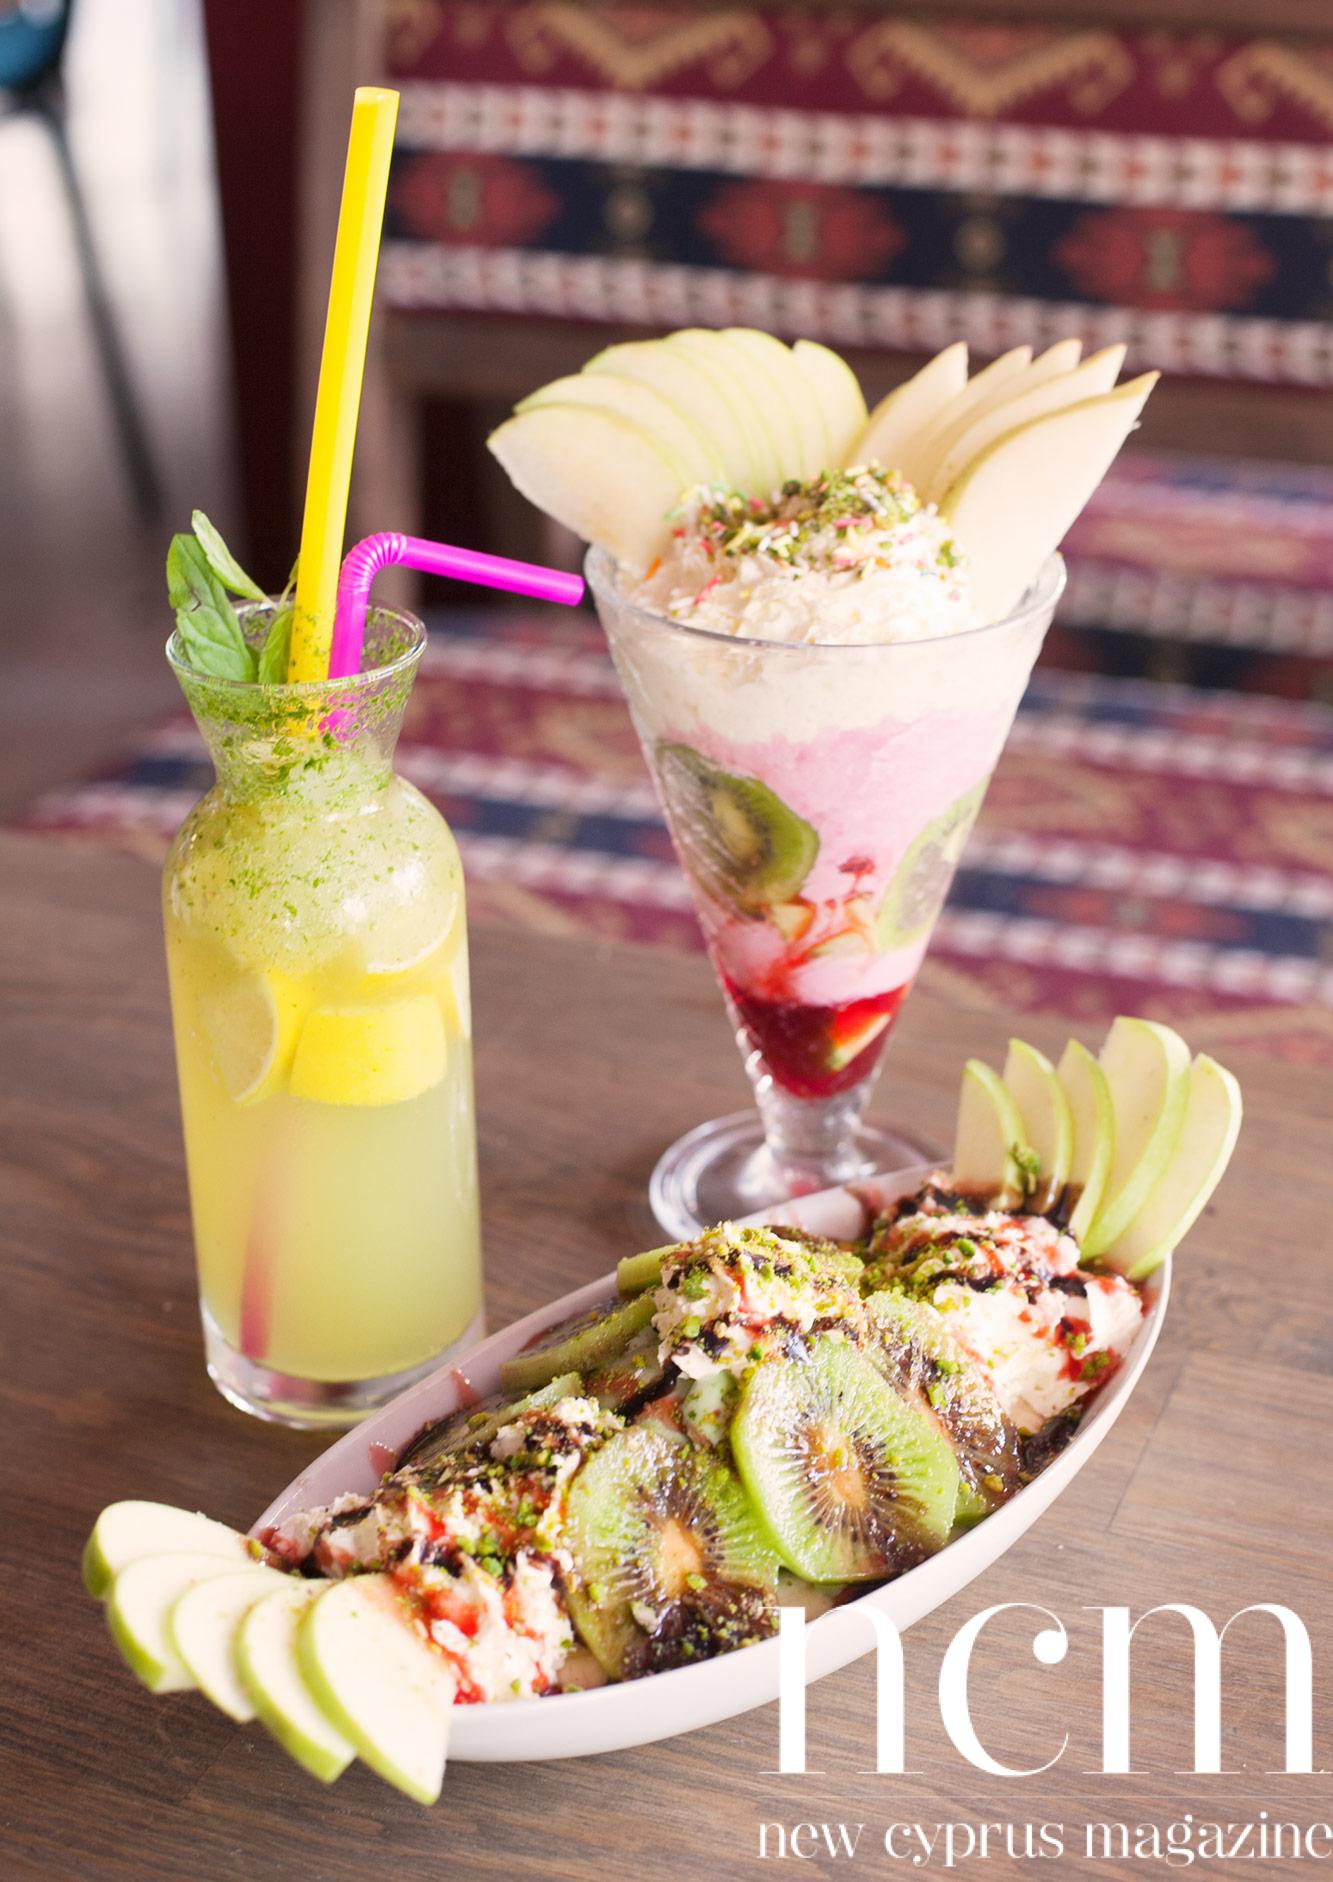 Muhabbet Café Restaurant Famagusta North Cyprus